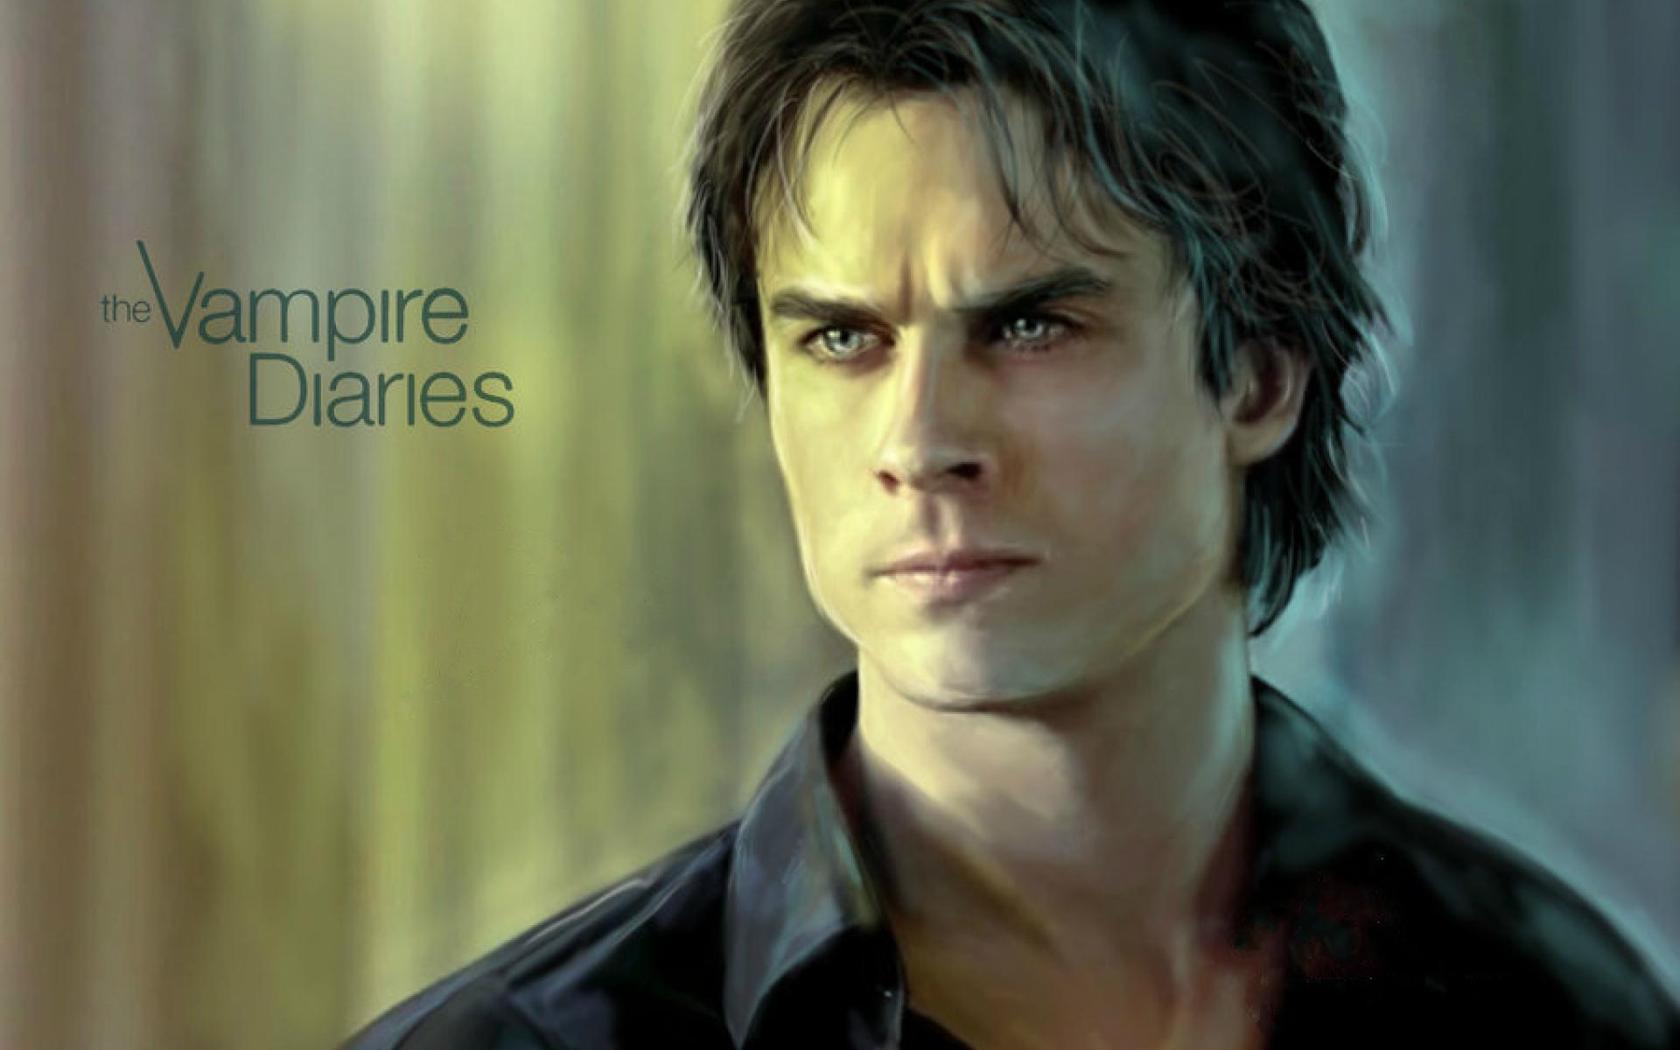 Ian Somerhalder Vampire Diaries Wallpapers Wallpaper Cave